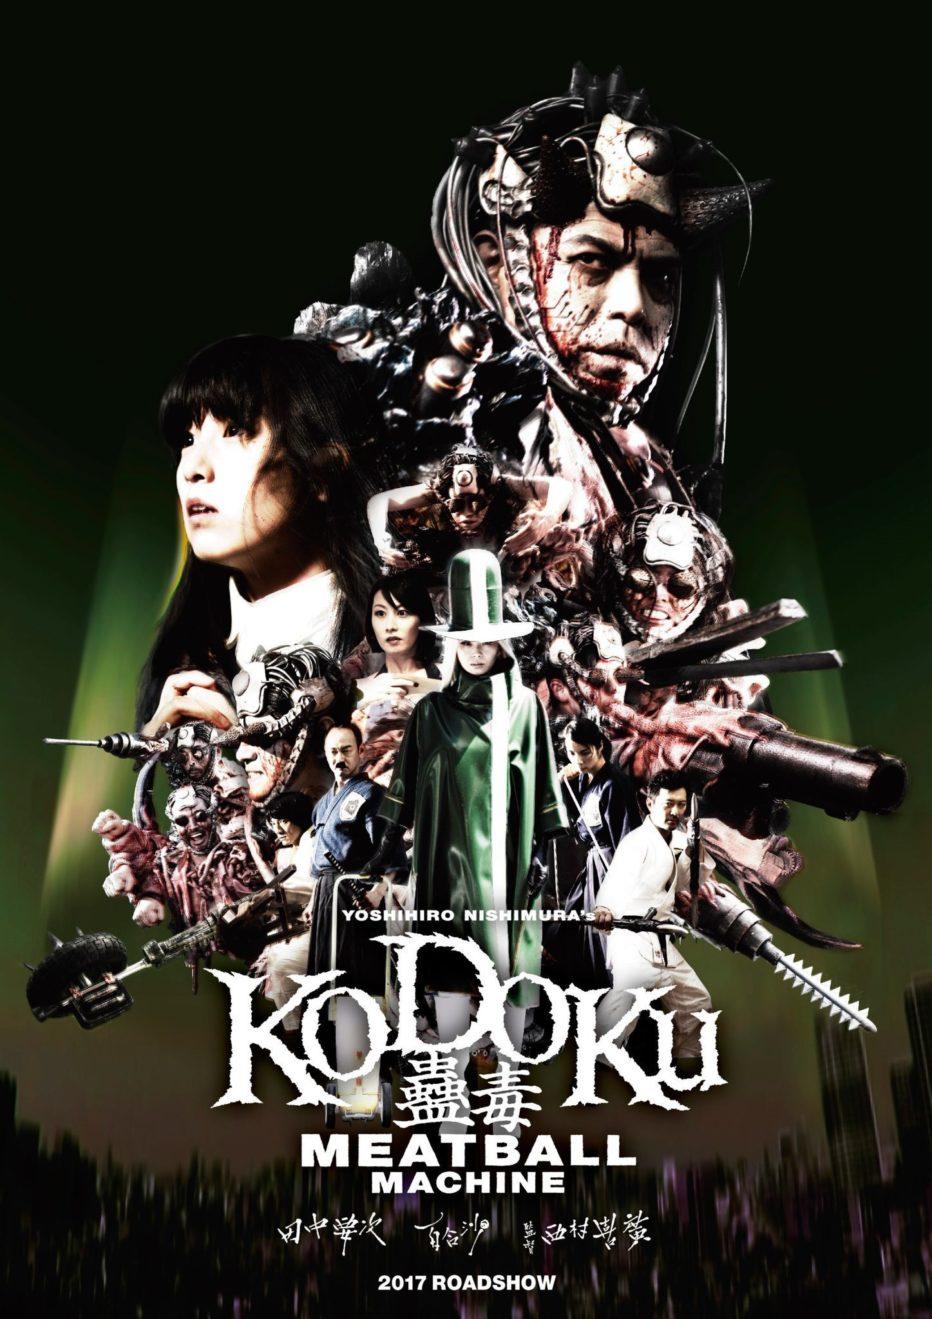 Meatball Machine Kodoku